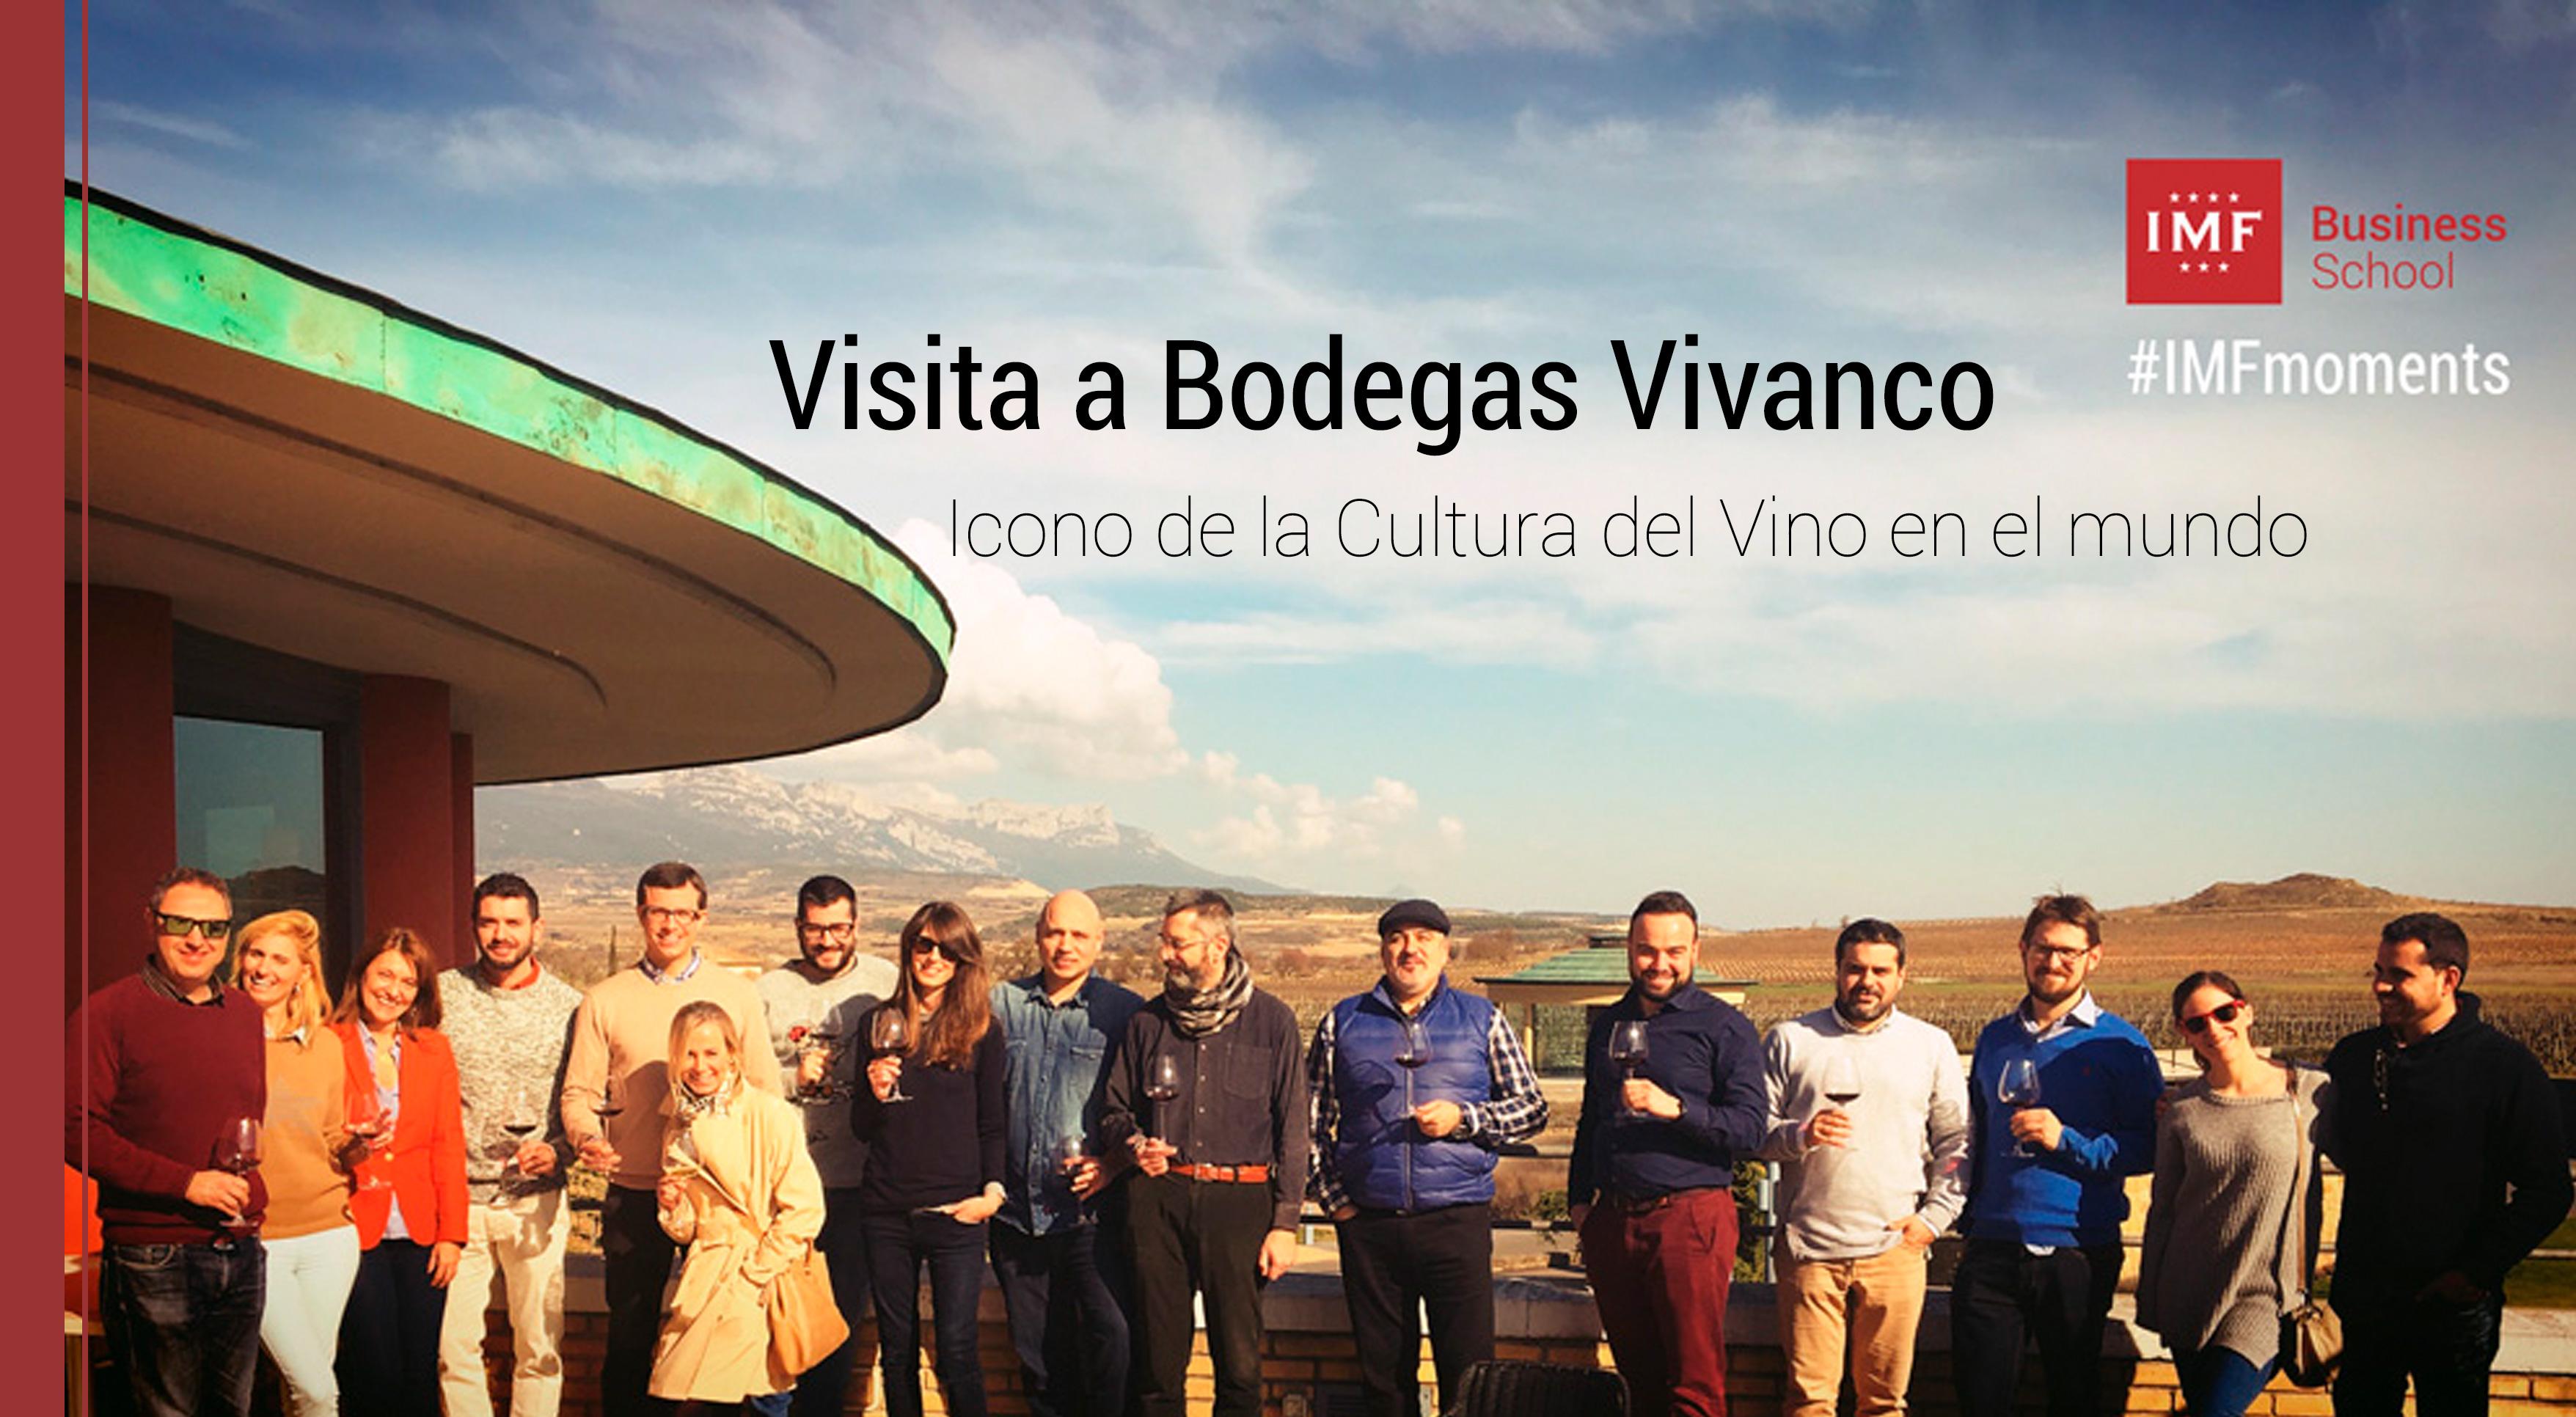 visita-bodegas-vivanco-cultura-vino Nuestros alumnos de MBA Enología visitan Bodegas Vivanco